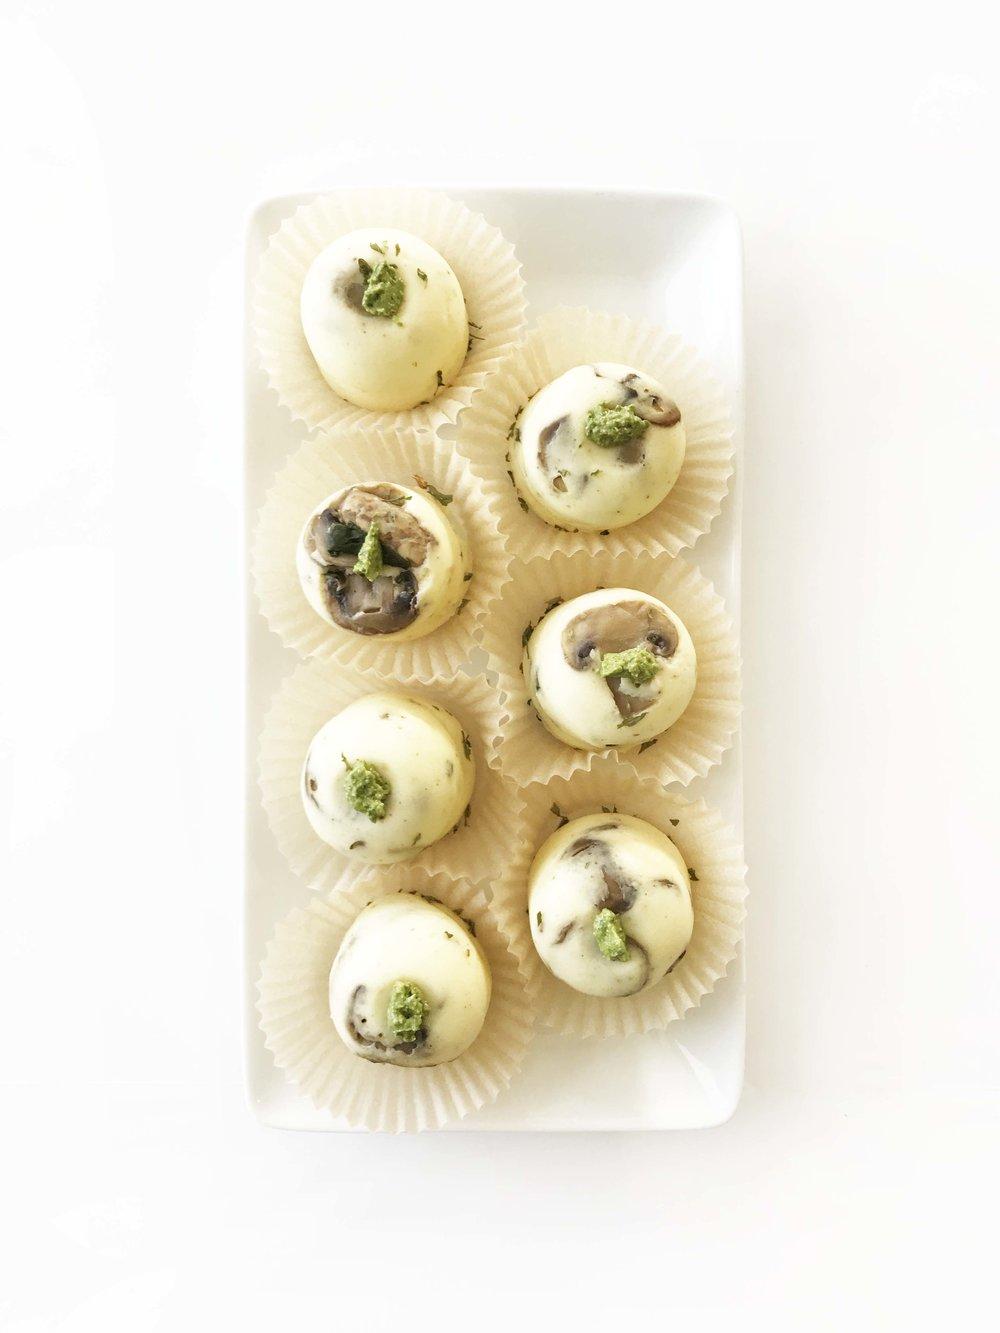 spinach-mushroom-egg-bites9.jpg